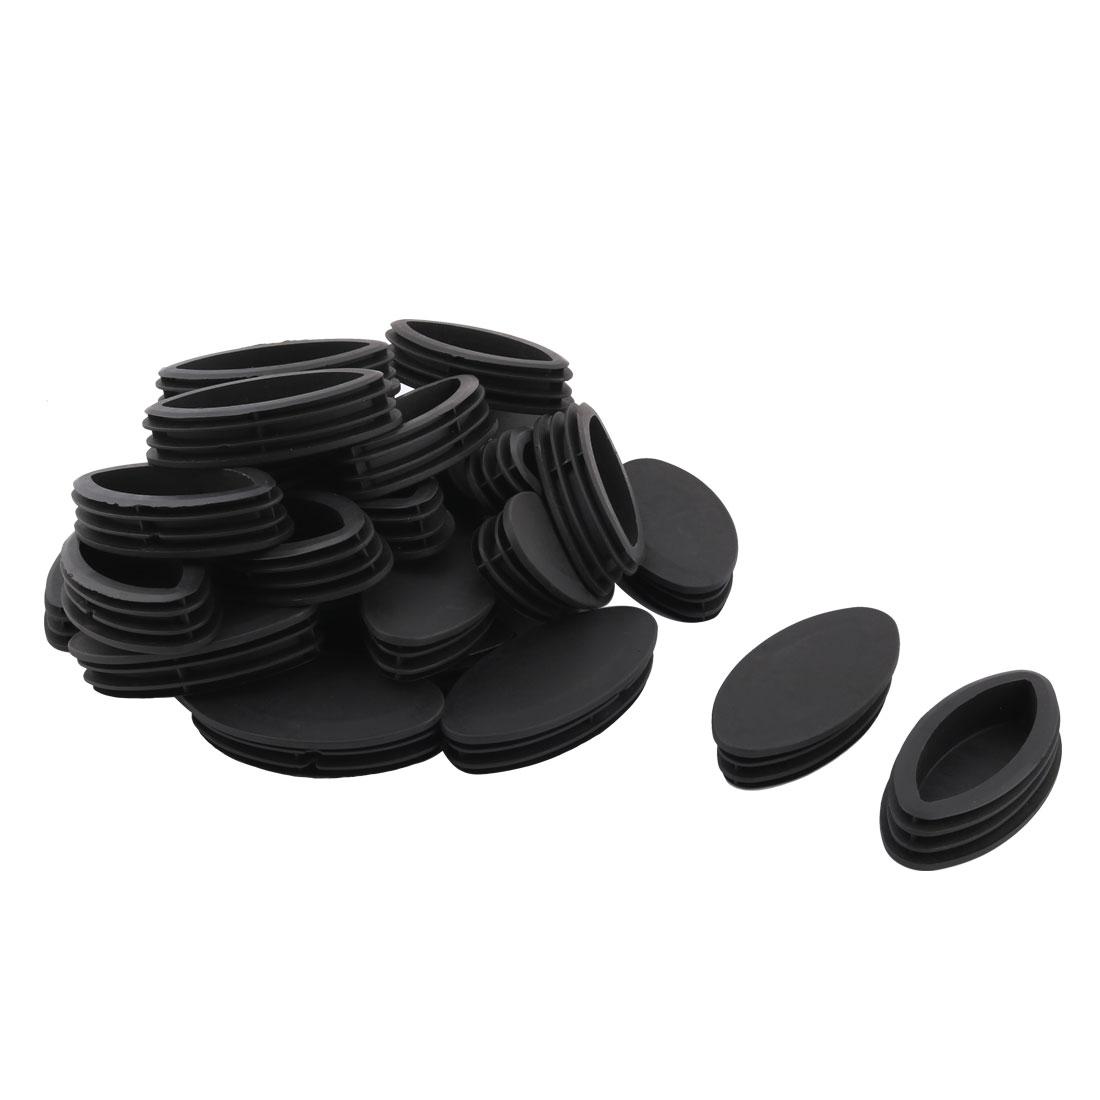 Plastic Oval Design Tube Insert End Blanking Cover Cap Black 100 x 50mm 30pcs